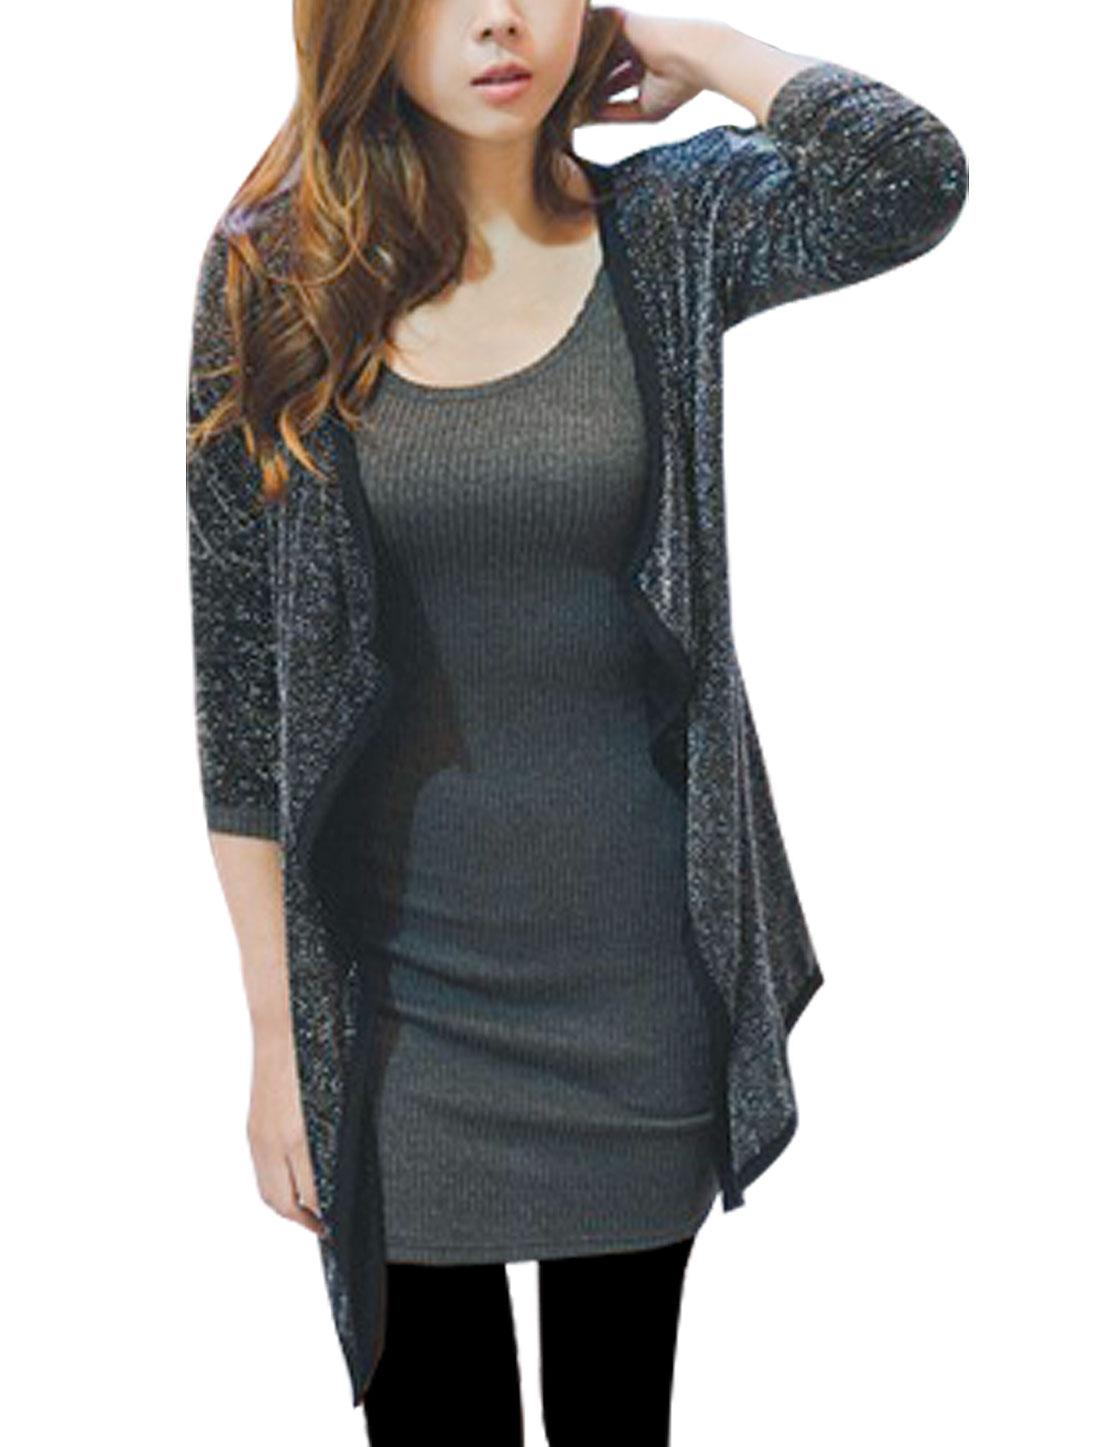 Dark Gray Knitting Long Sleeve Scoop Neck Tunic Shirt XS for Women